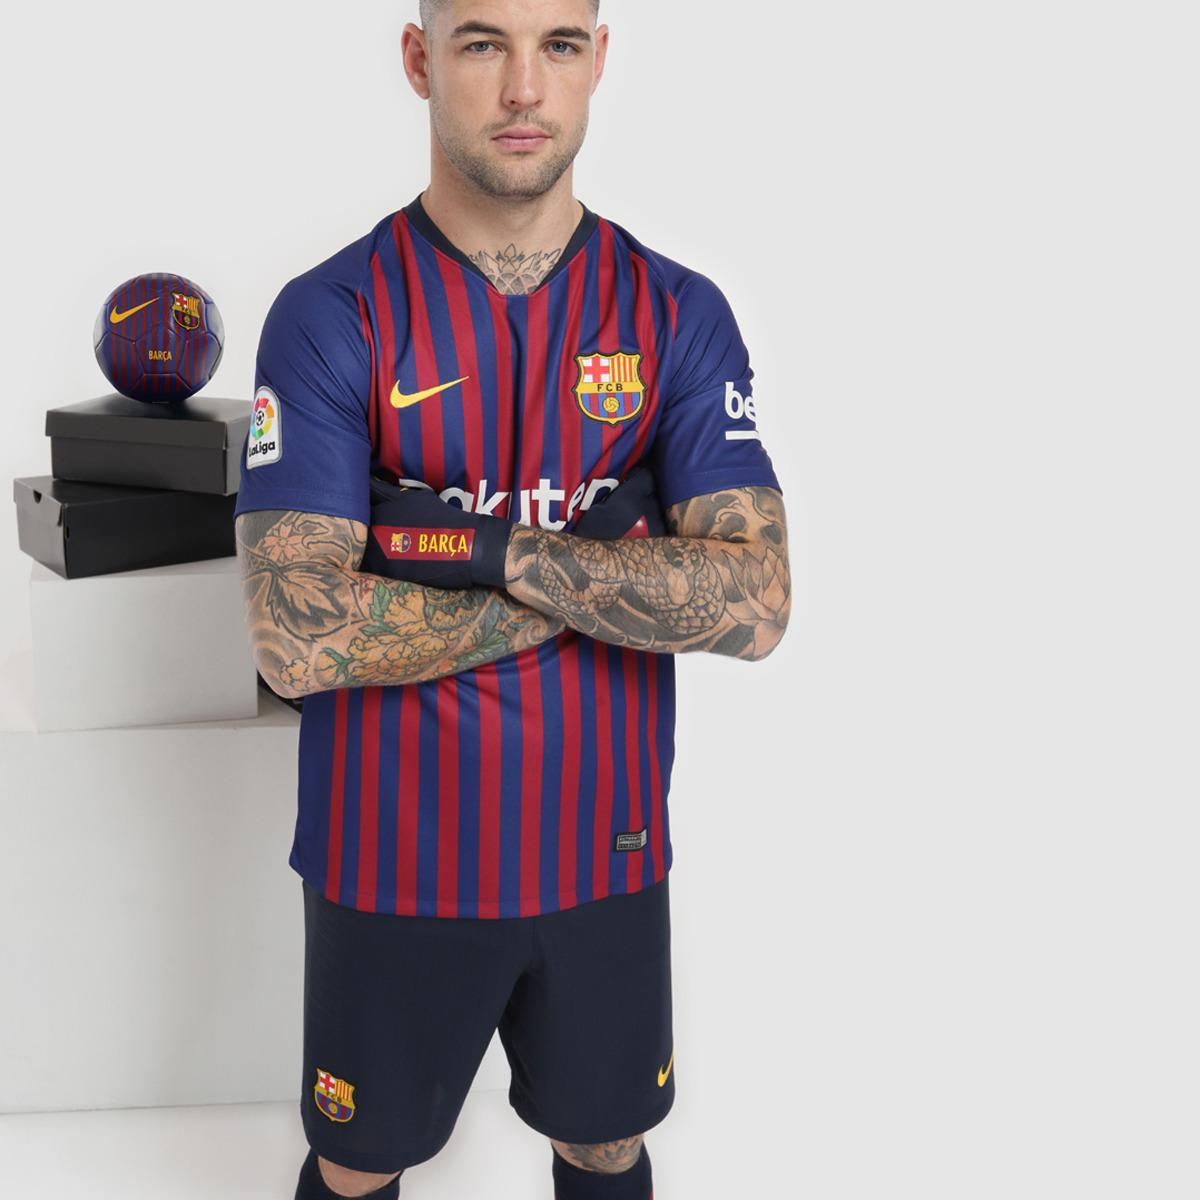 ba61e4241fa Nike. Men s Blue Fc Barcelona 2018-2019 Breathe Stadium Home Strip T-shirt.  £75 £53 From El Corte Ingles